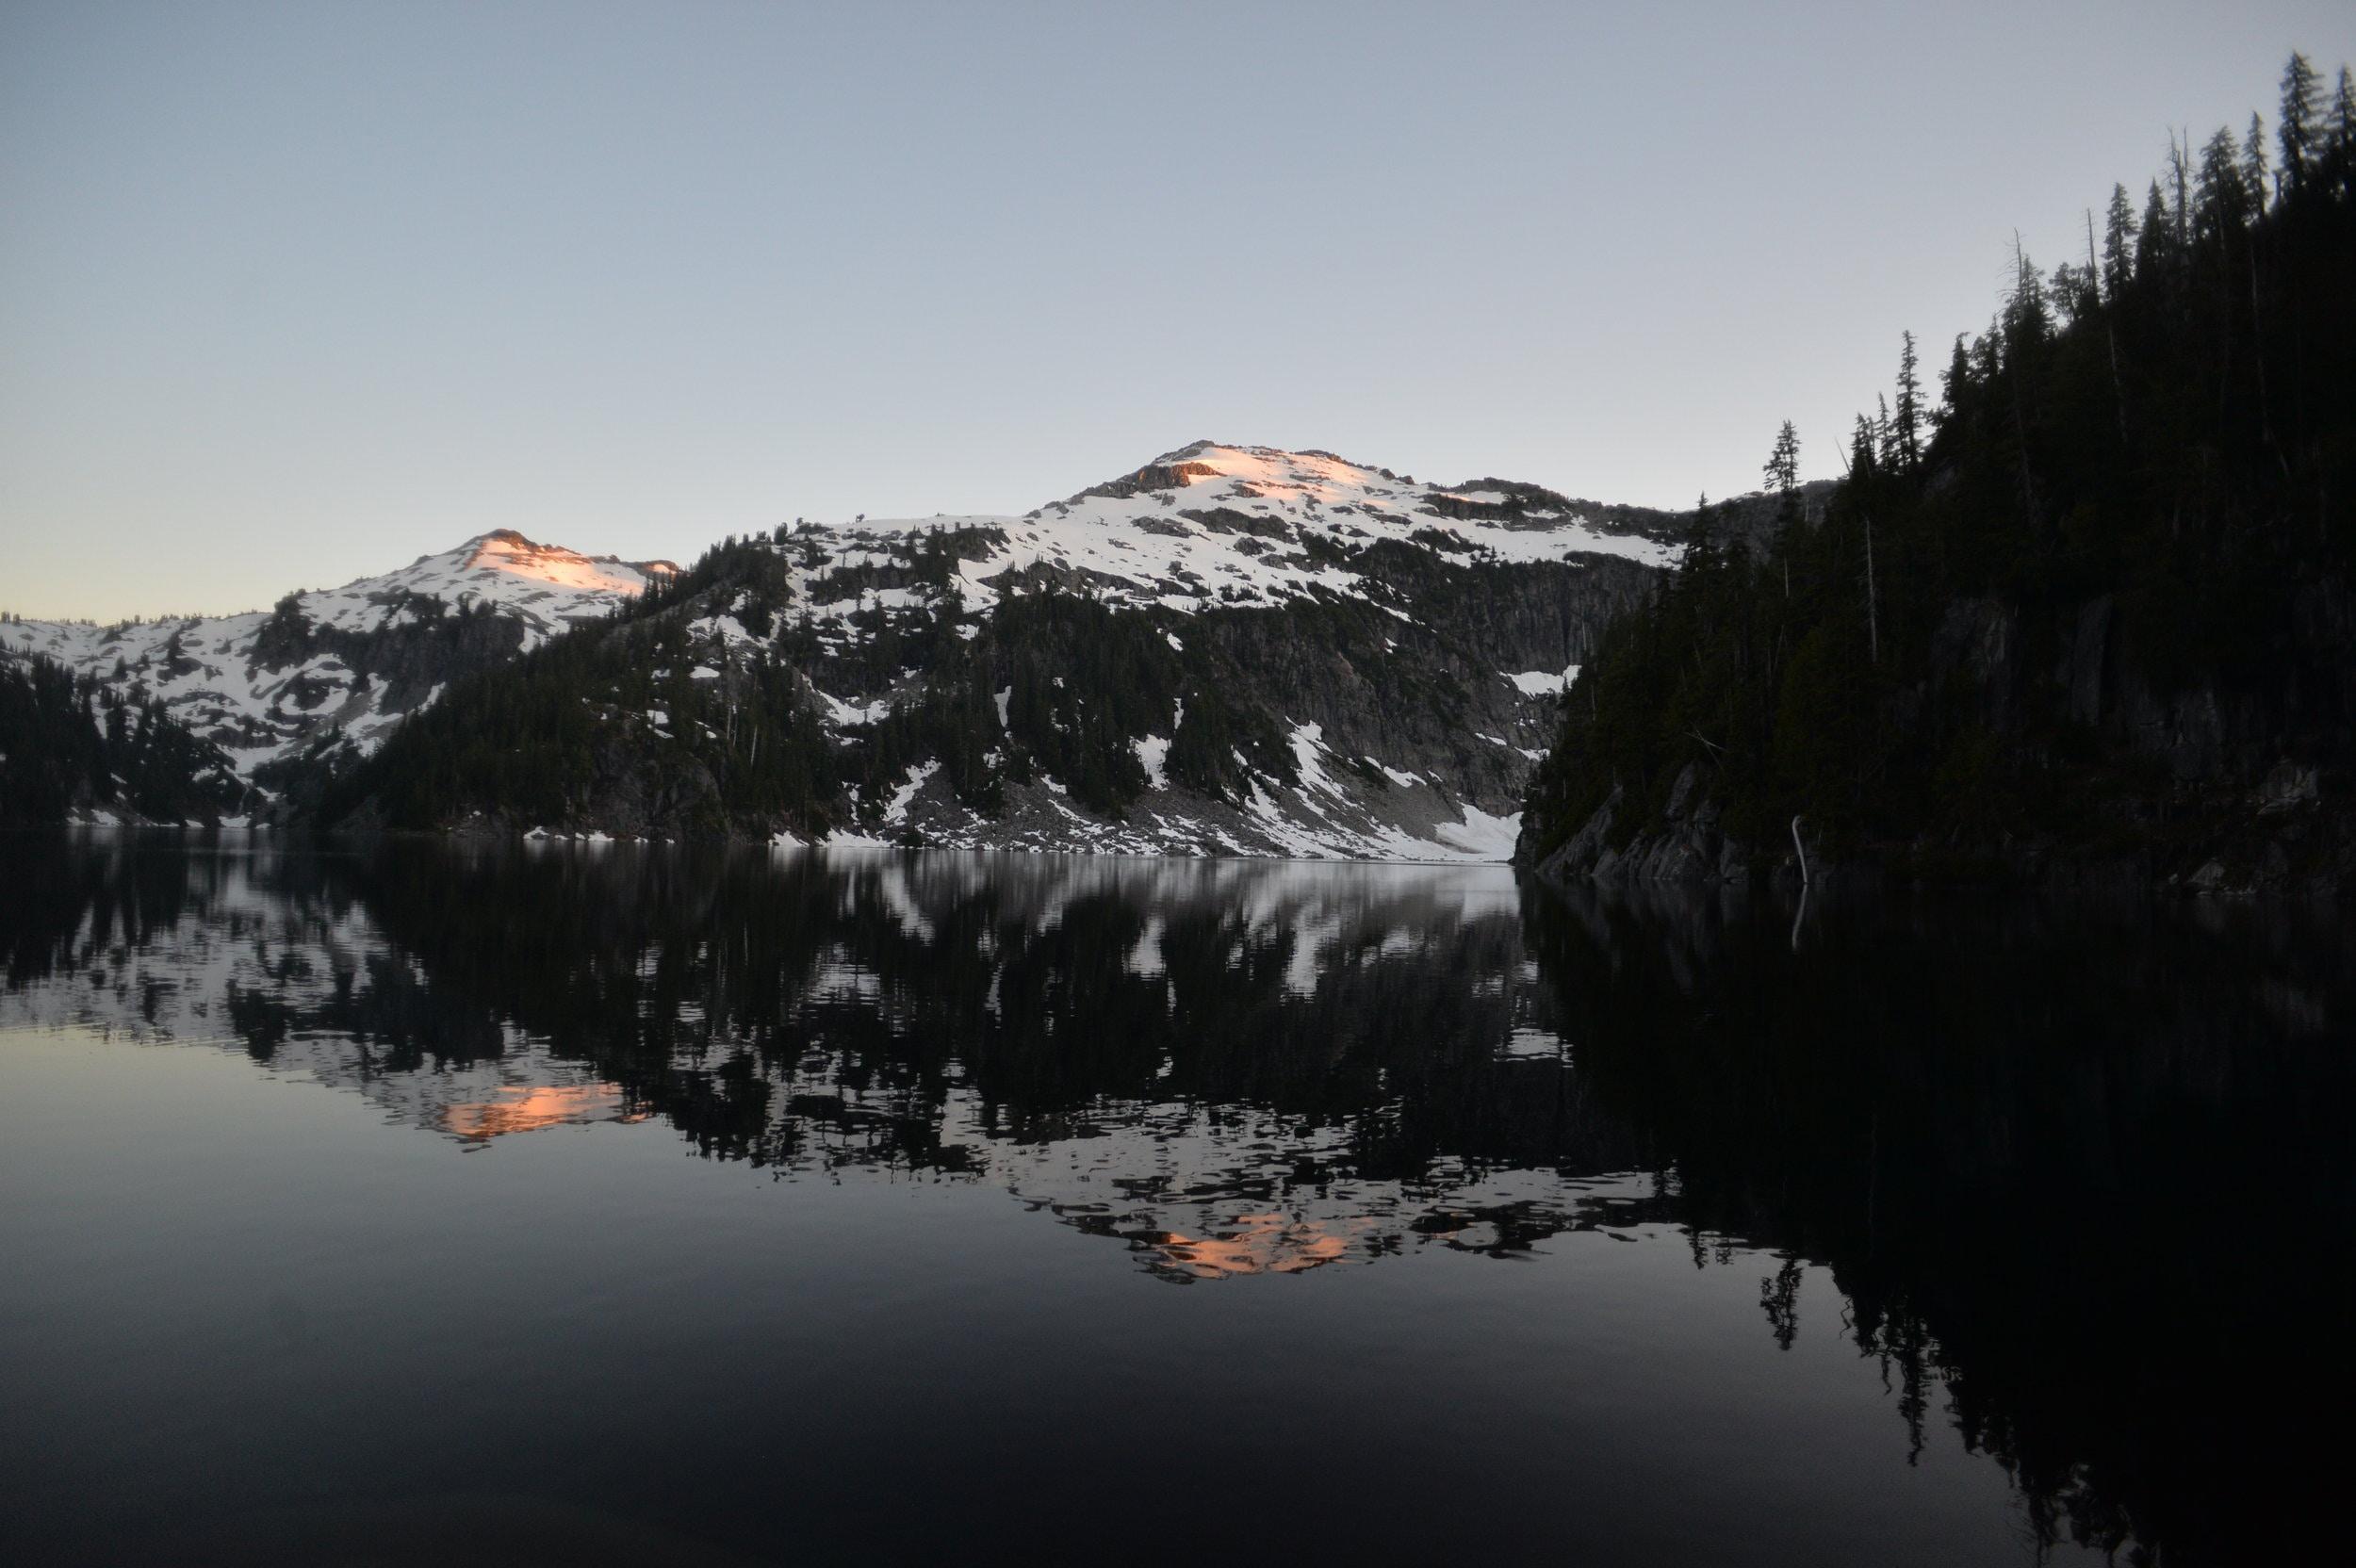 silhouette of trees near mountain